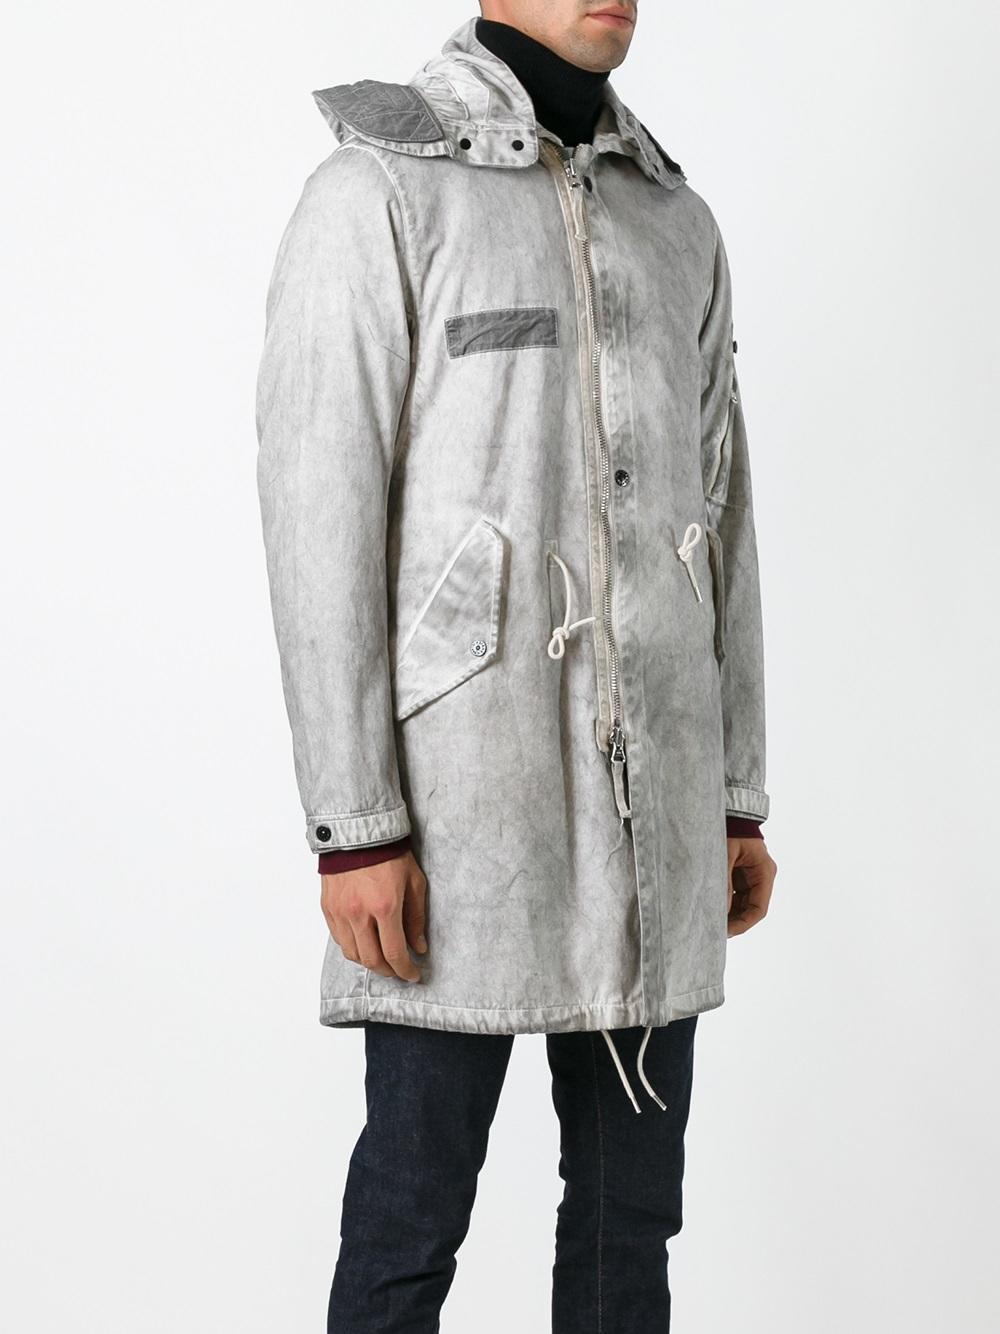 lyst stone island 39 over dyed 39 parka coat in gray for men. Black Bedroom Furniture Sets. Home Design Ideas